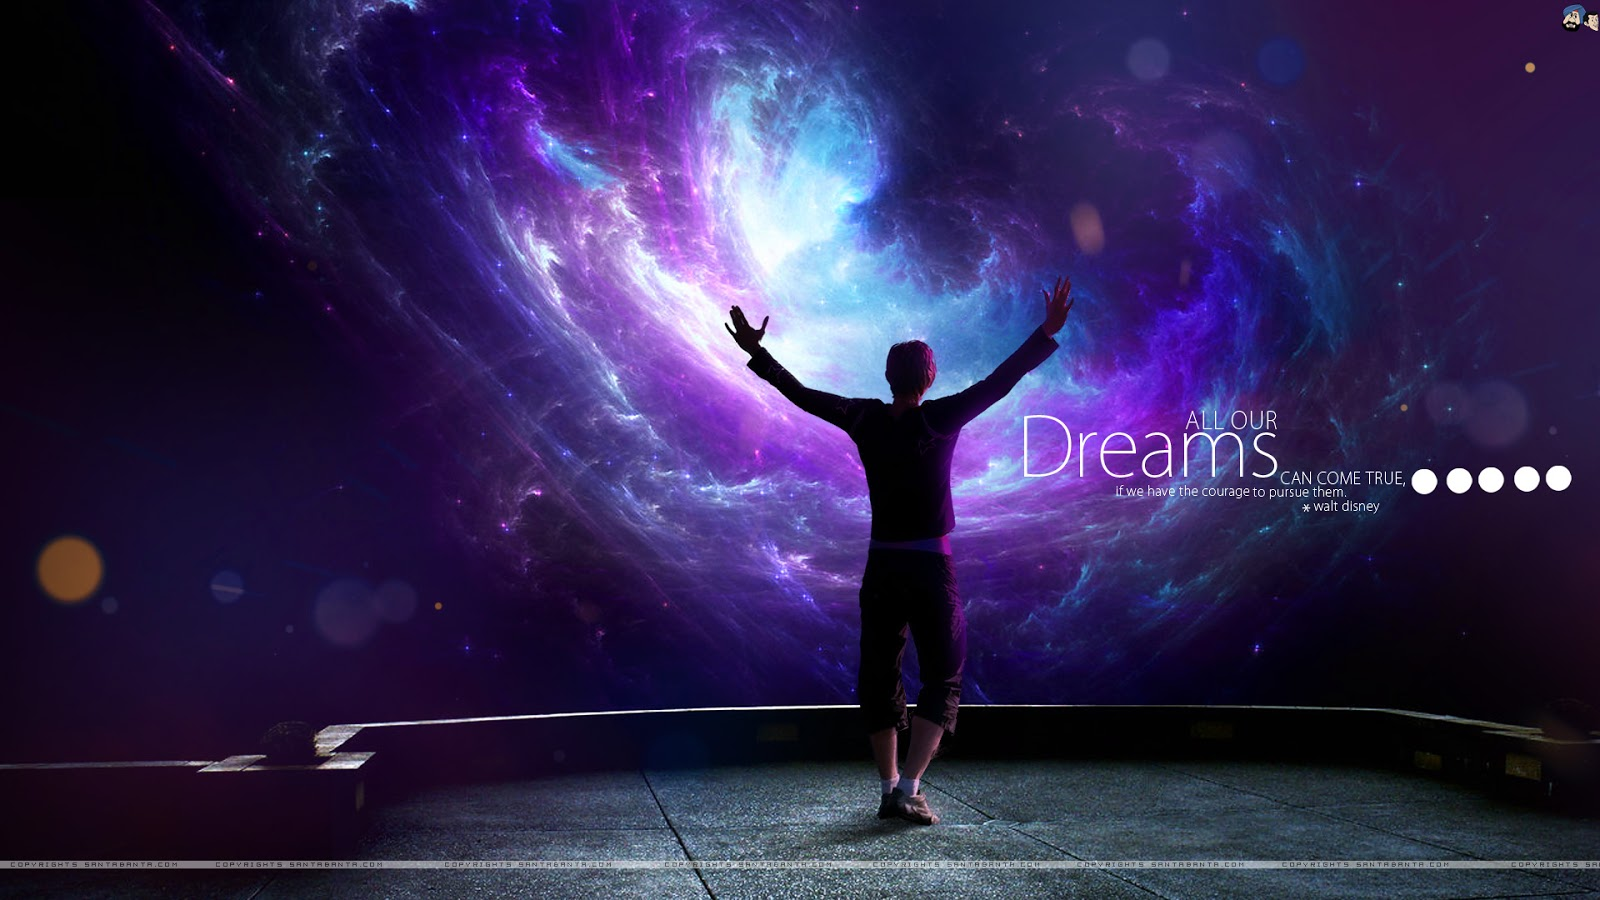 Motivation wallpapers set 2 fitness center - Fitness wallpapers for desktop ...